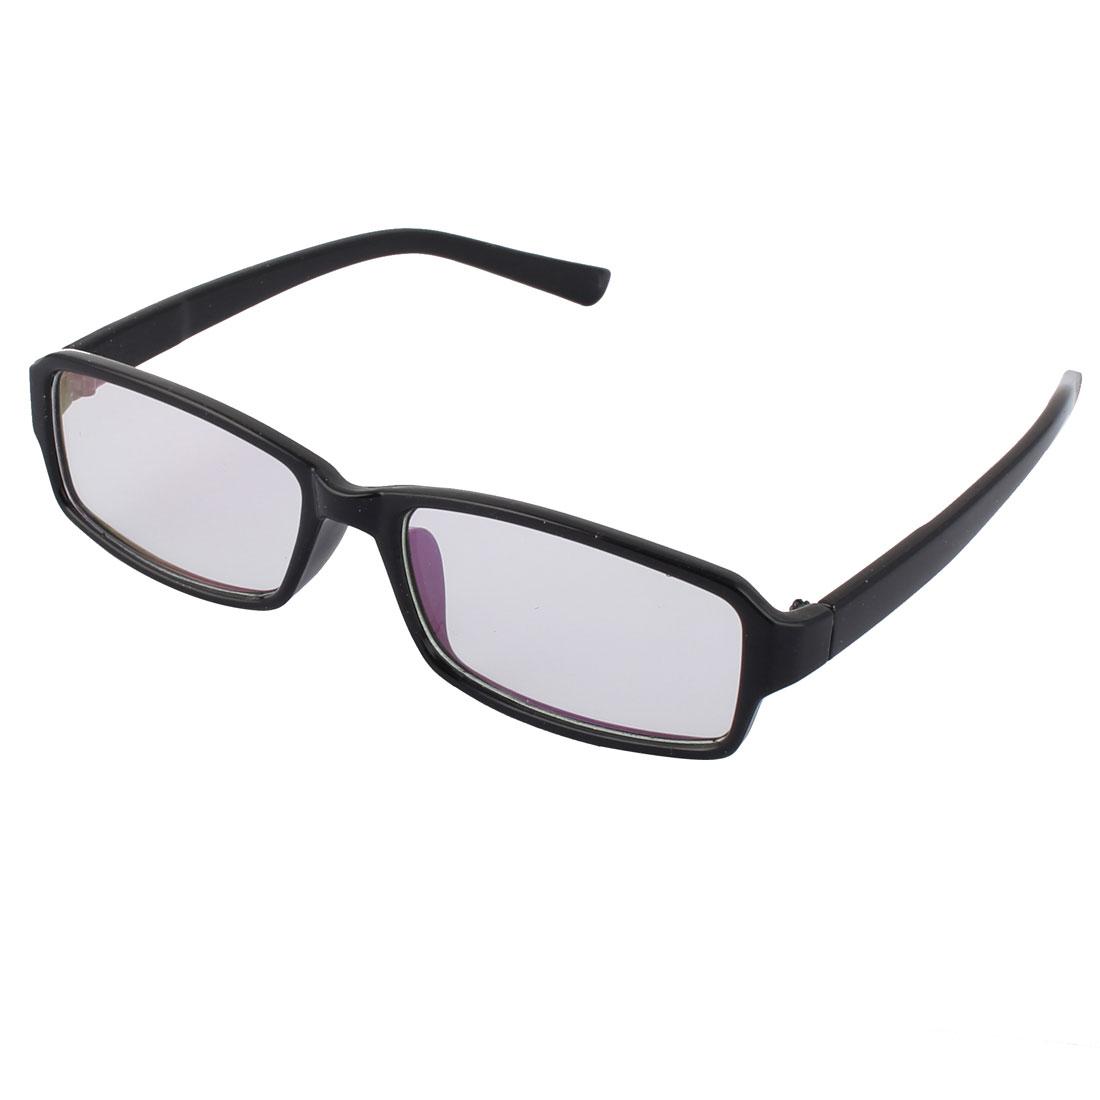 Fashionable Clear Lens Black Frame Plastic Eyewear Plain Glass